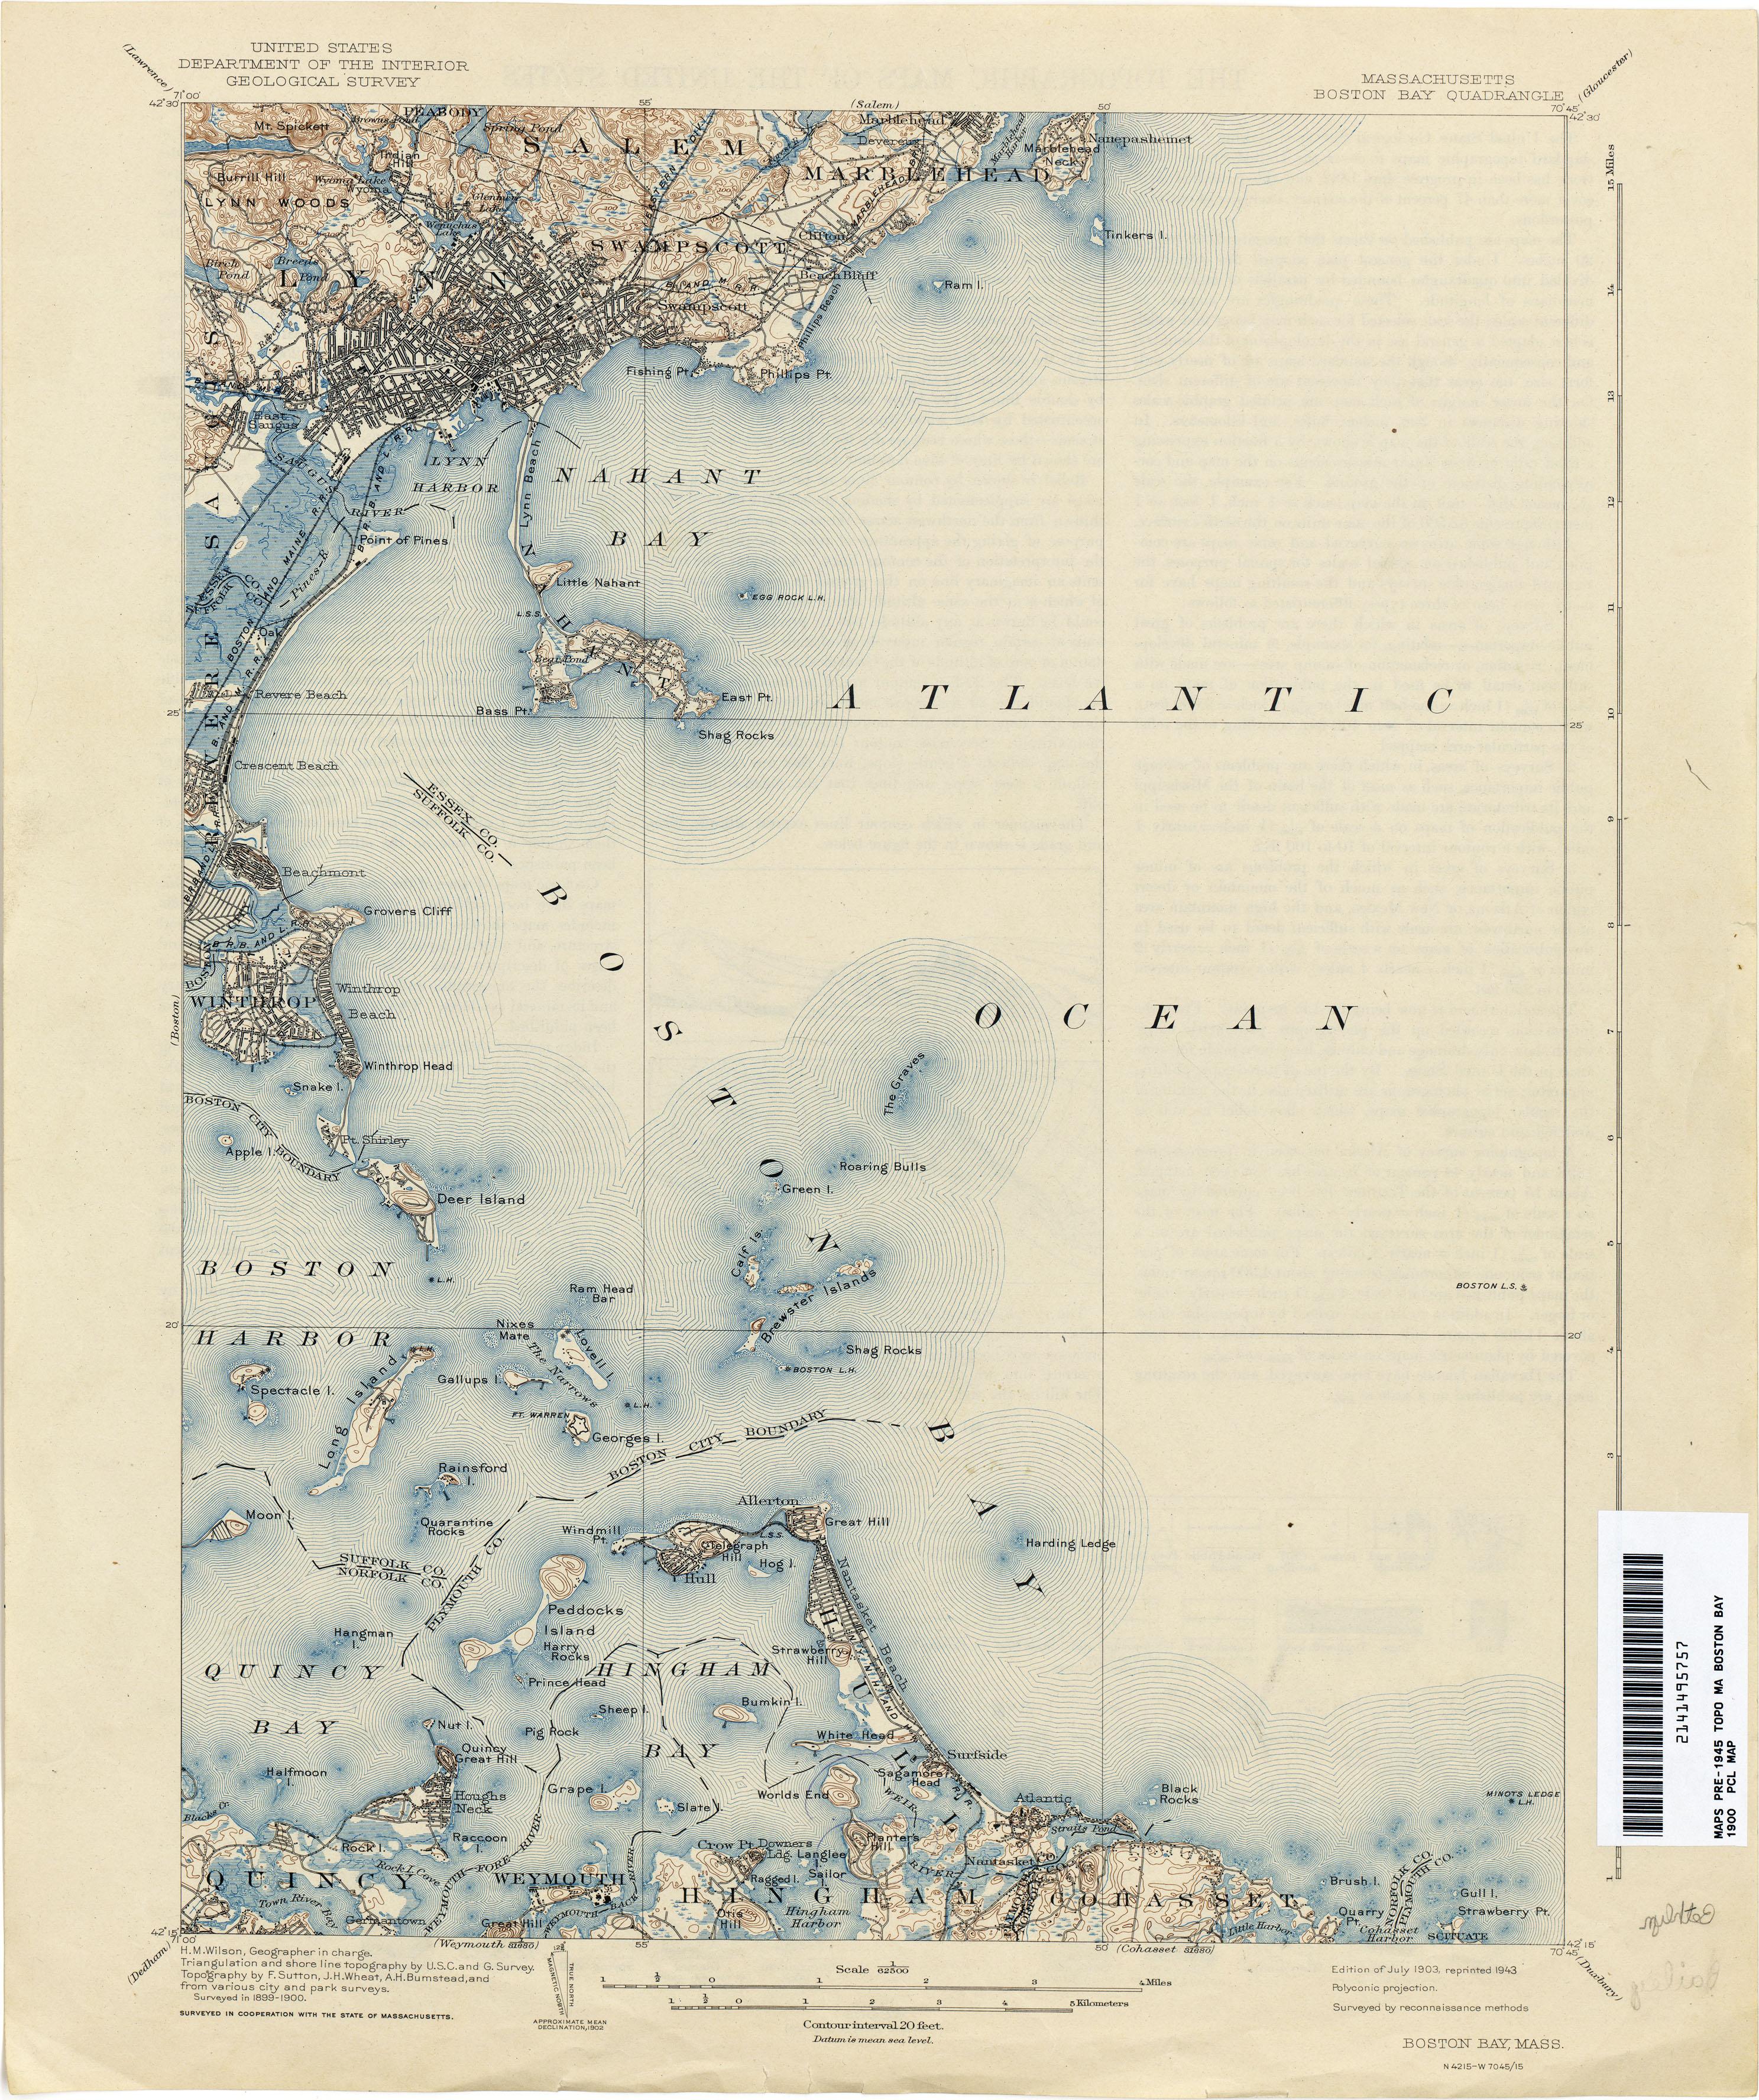 Massachusetts Historical Topographic Maps Perry Castaneda Map